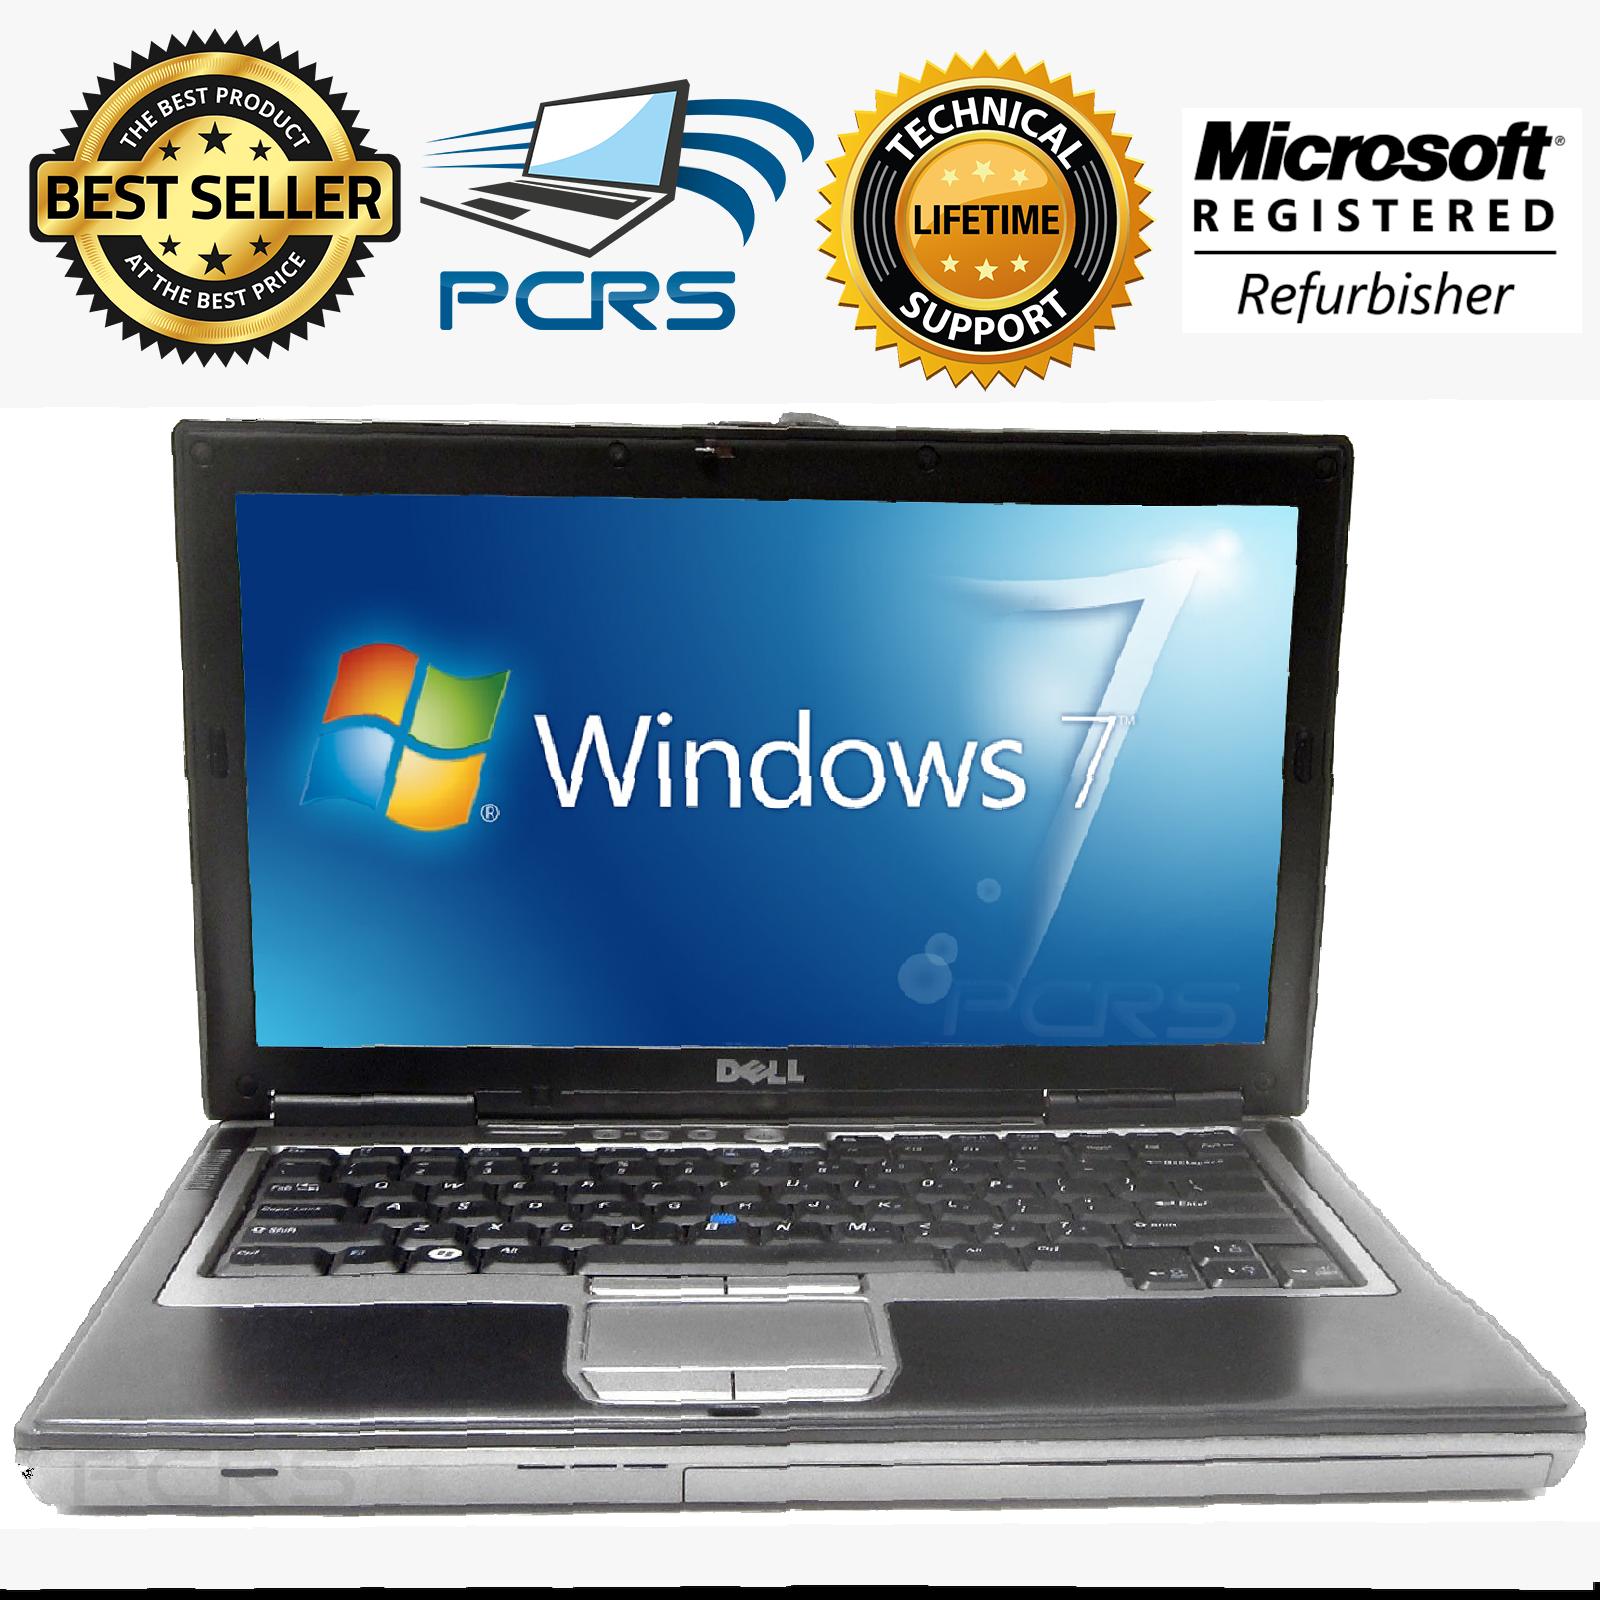 Laptop - DELL Latitude Laptop 15.4 HD Widescreen DVD Intel Core 2 Duo Windows WiFi